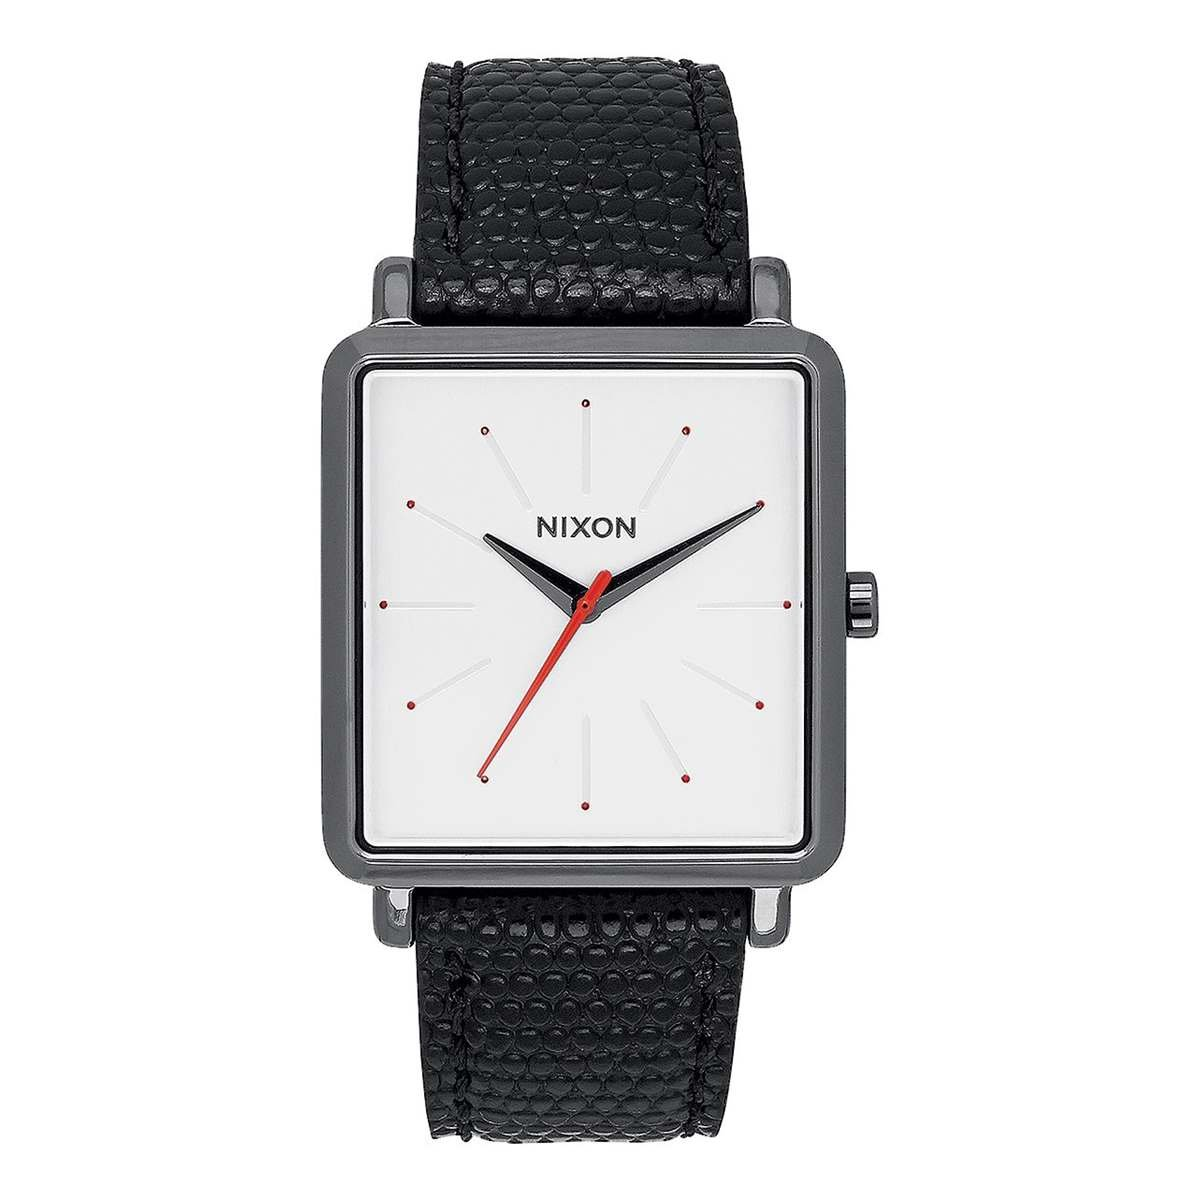 Reloj - Nixon - para - A472-131-00